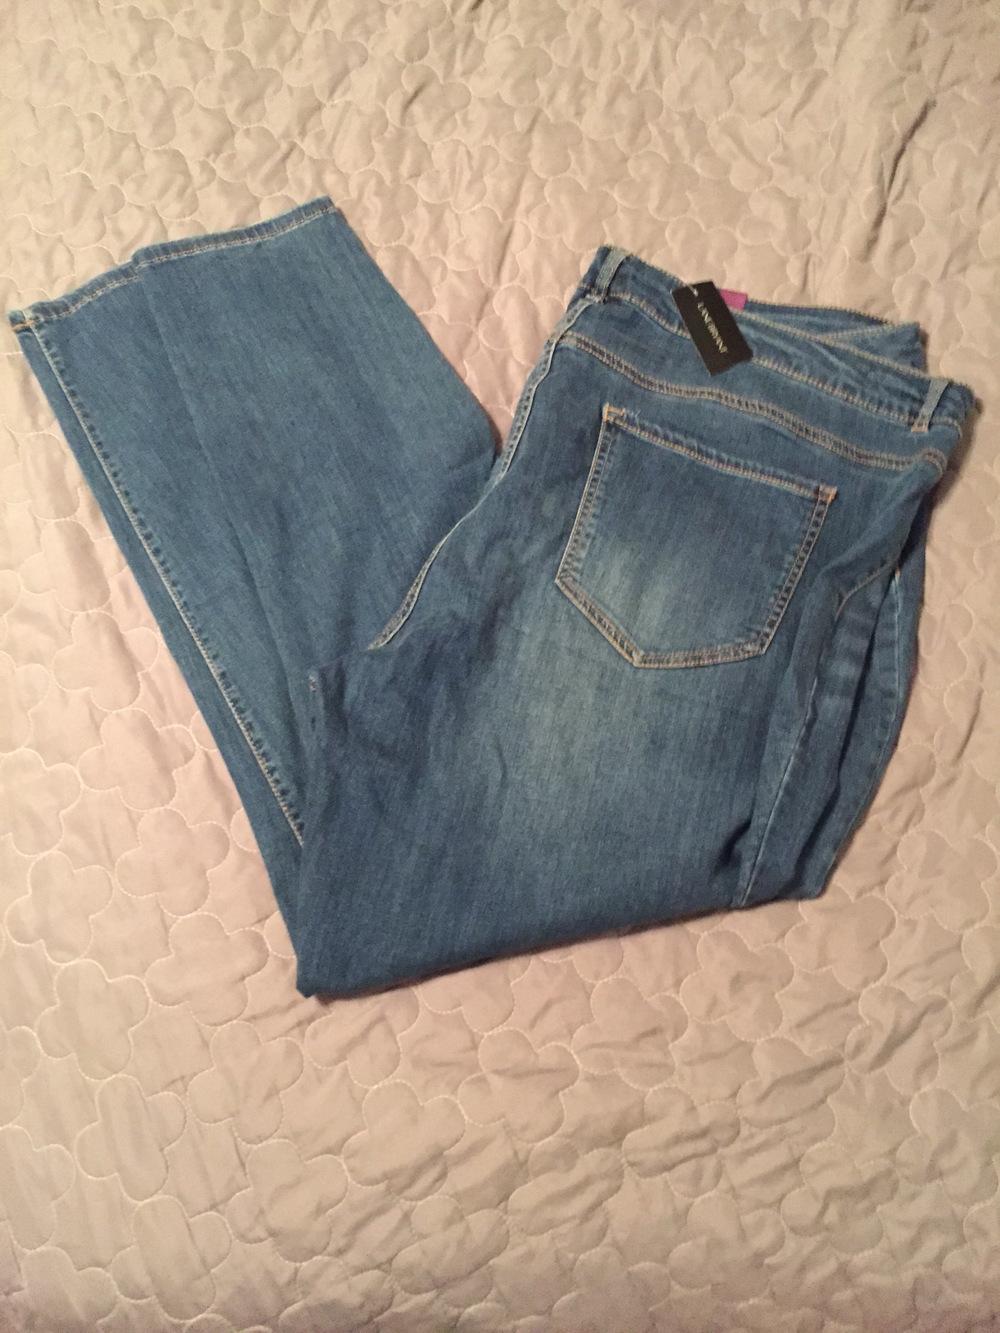 skinny jeans.jpg